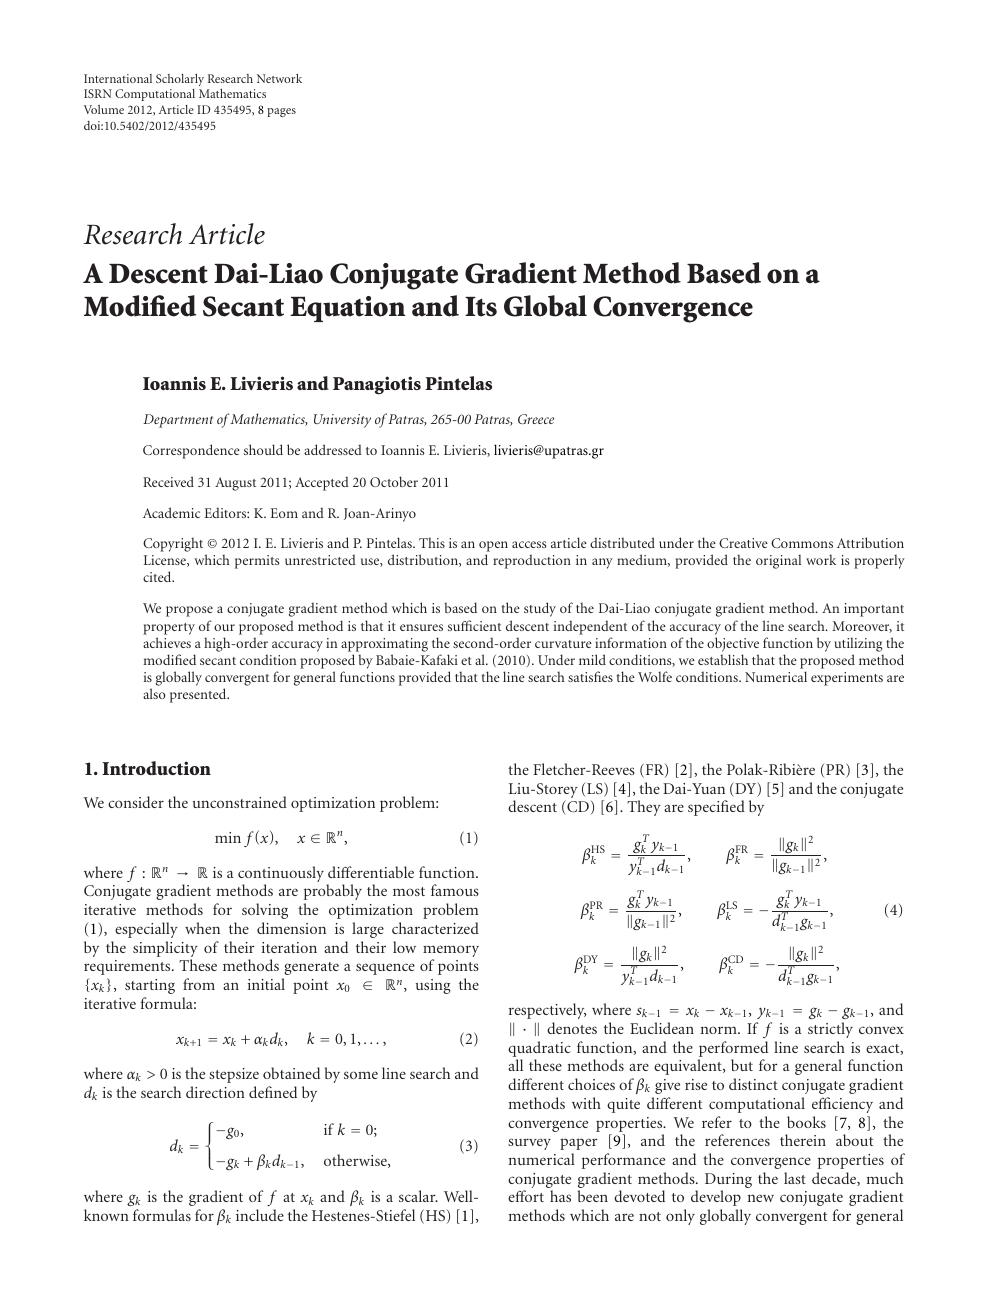 Modified secant method formula